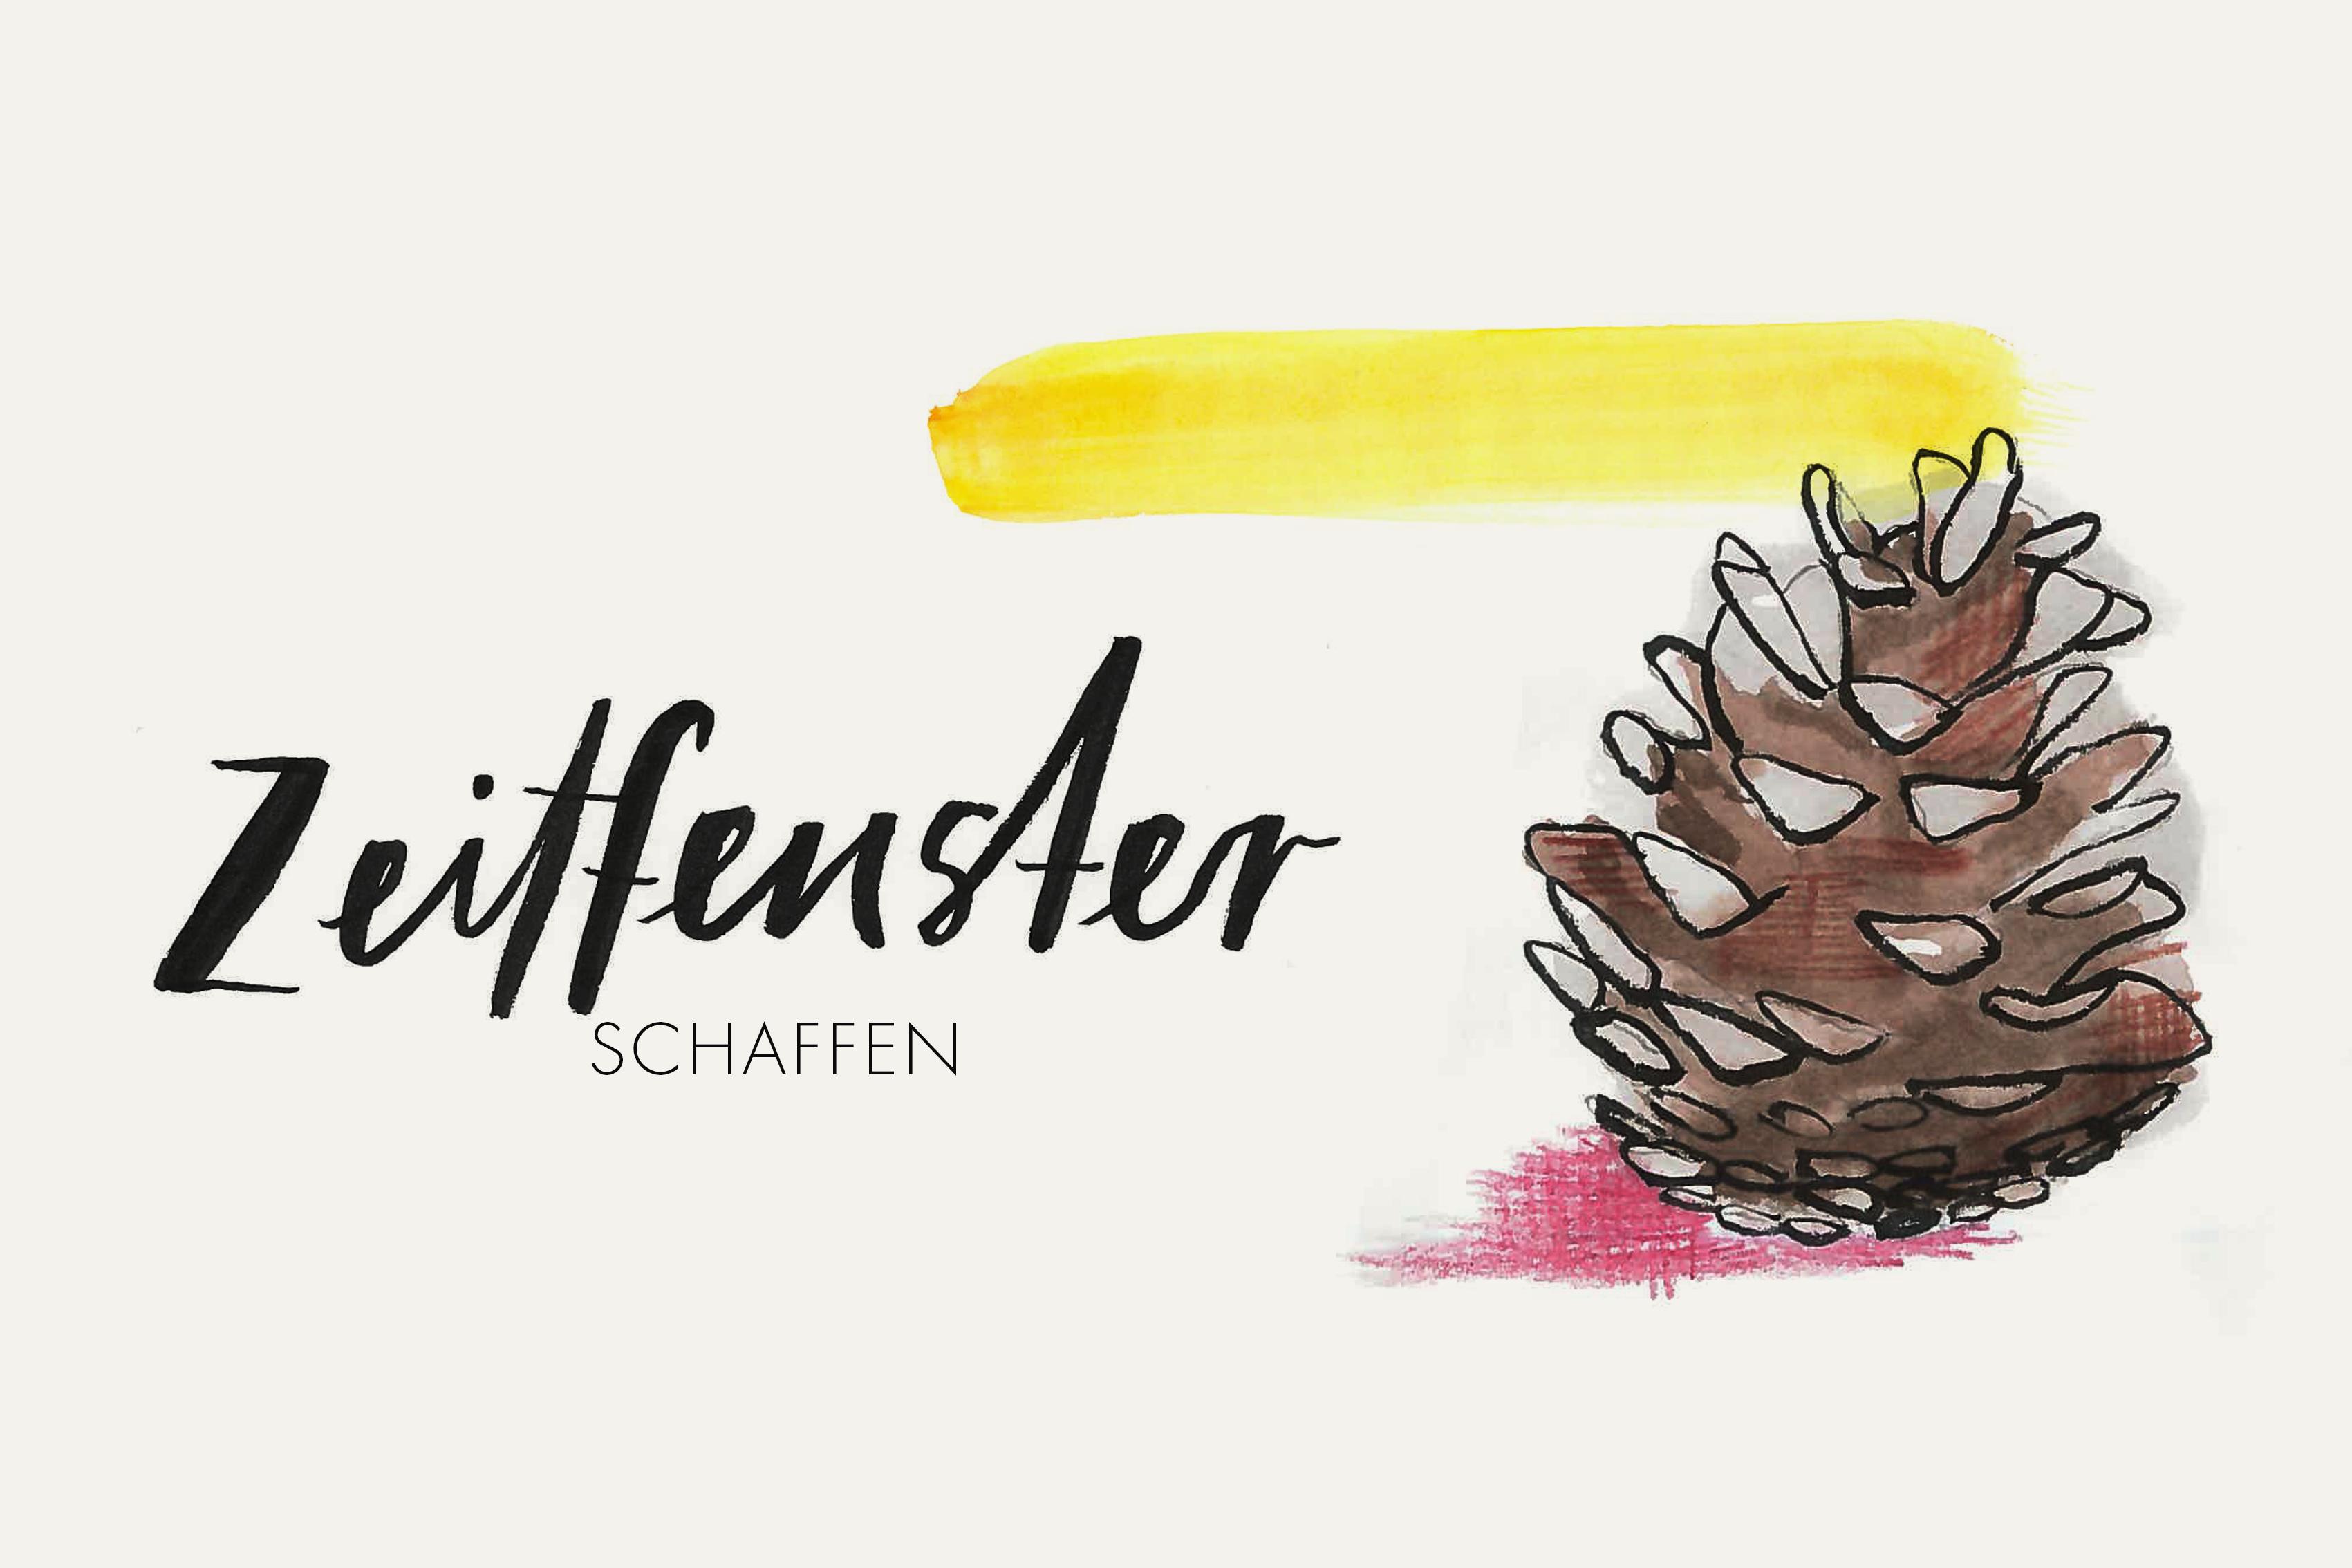 illusration_lettering_weihnachten_aquarell_pinecone